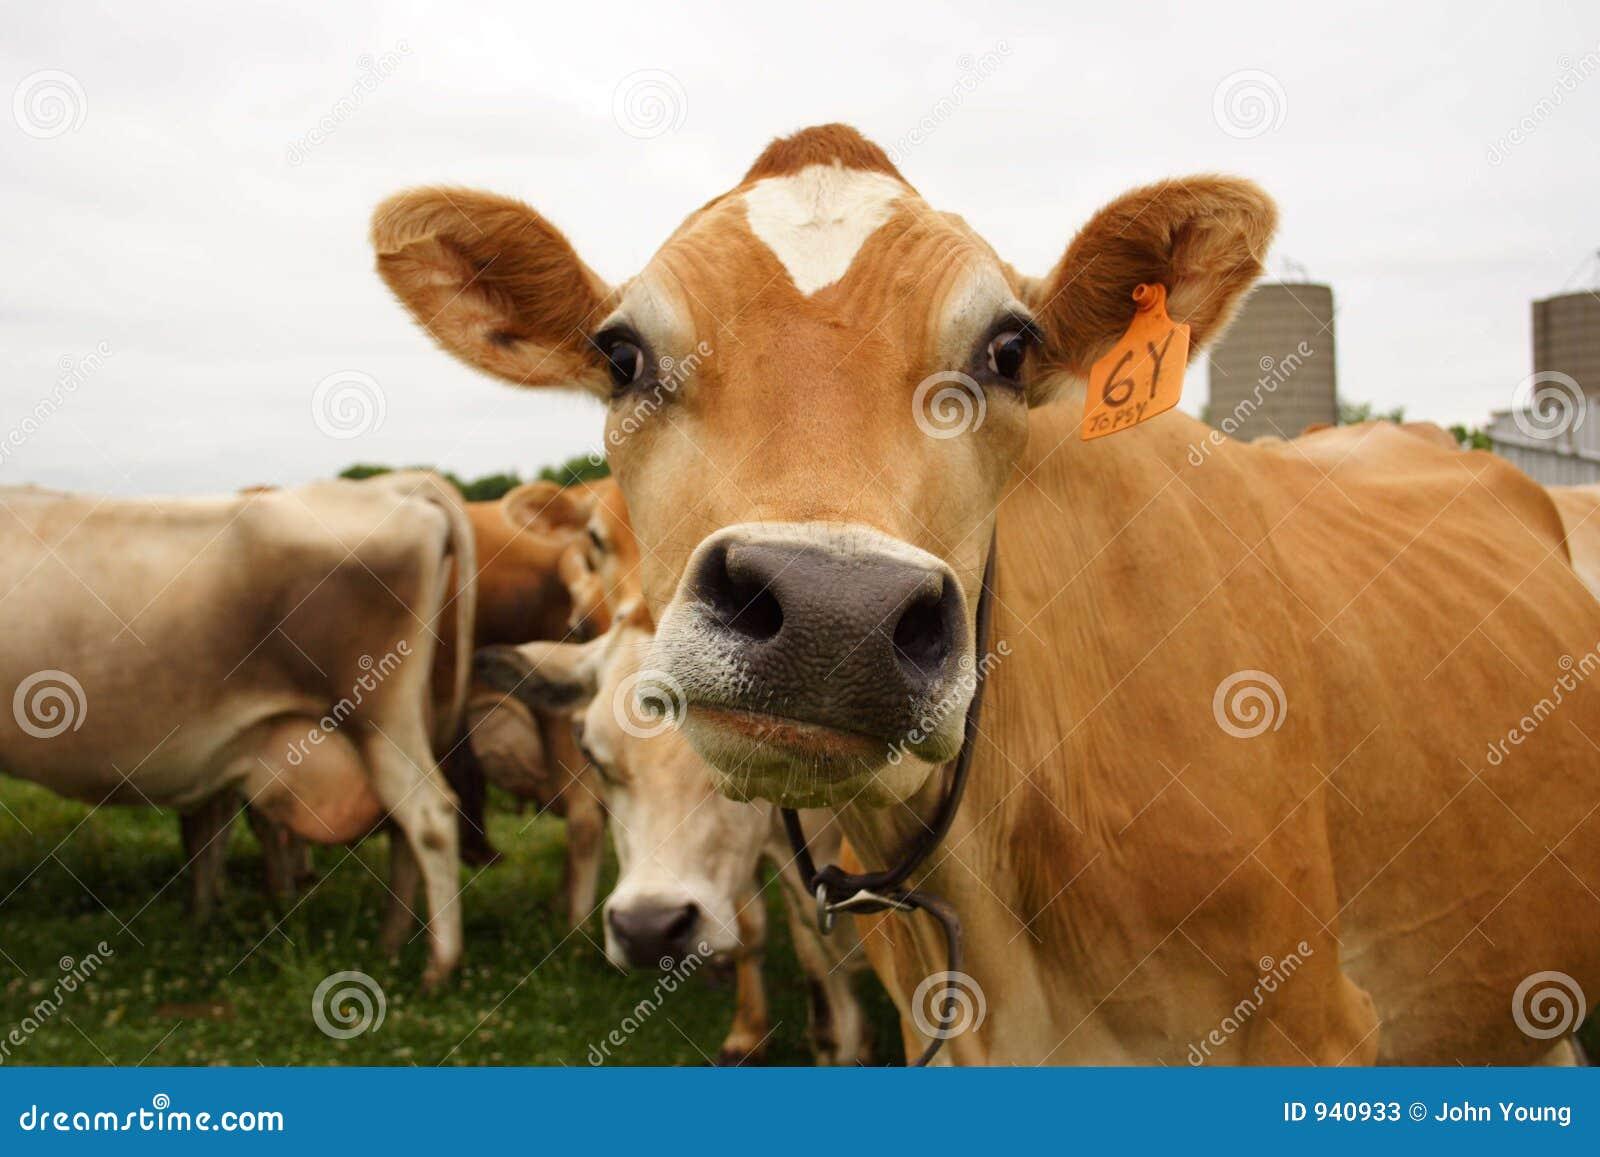 Funny Faced Cow Stock Photos - Image: 940933